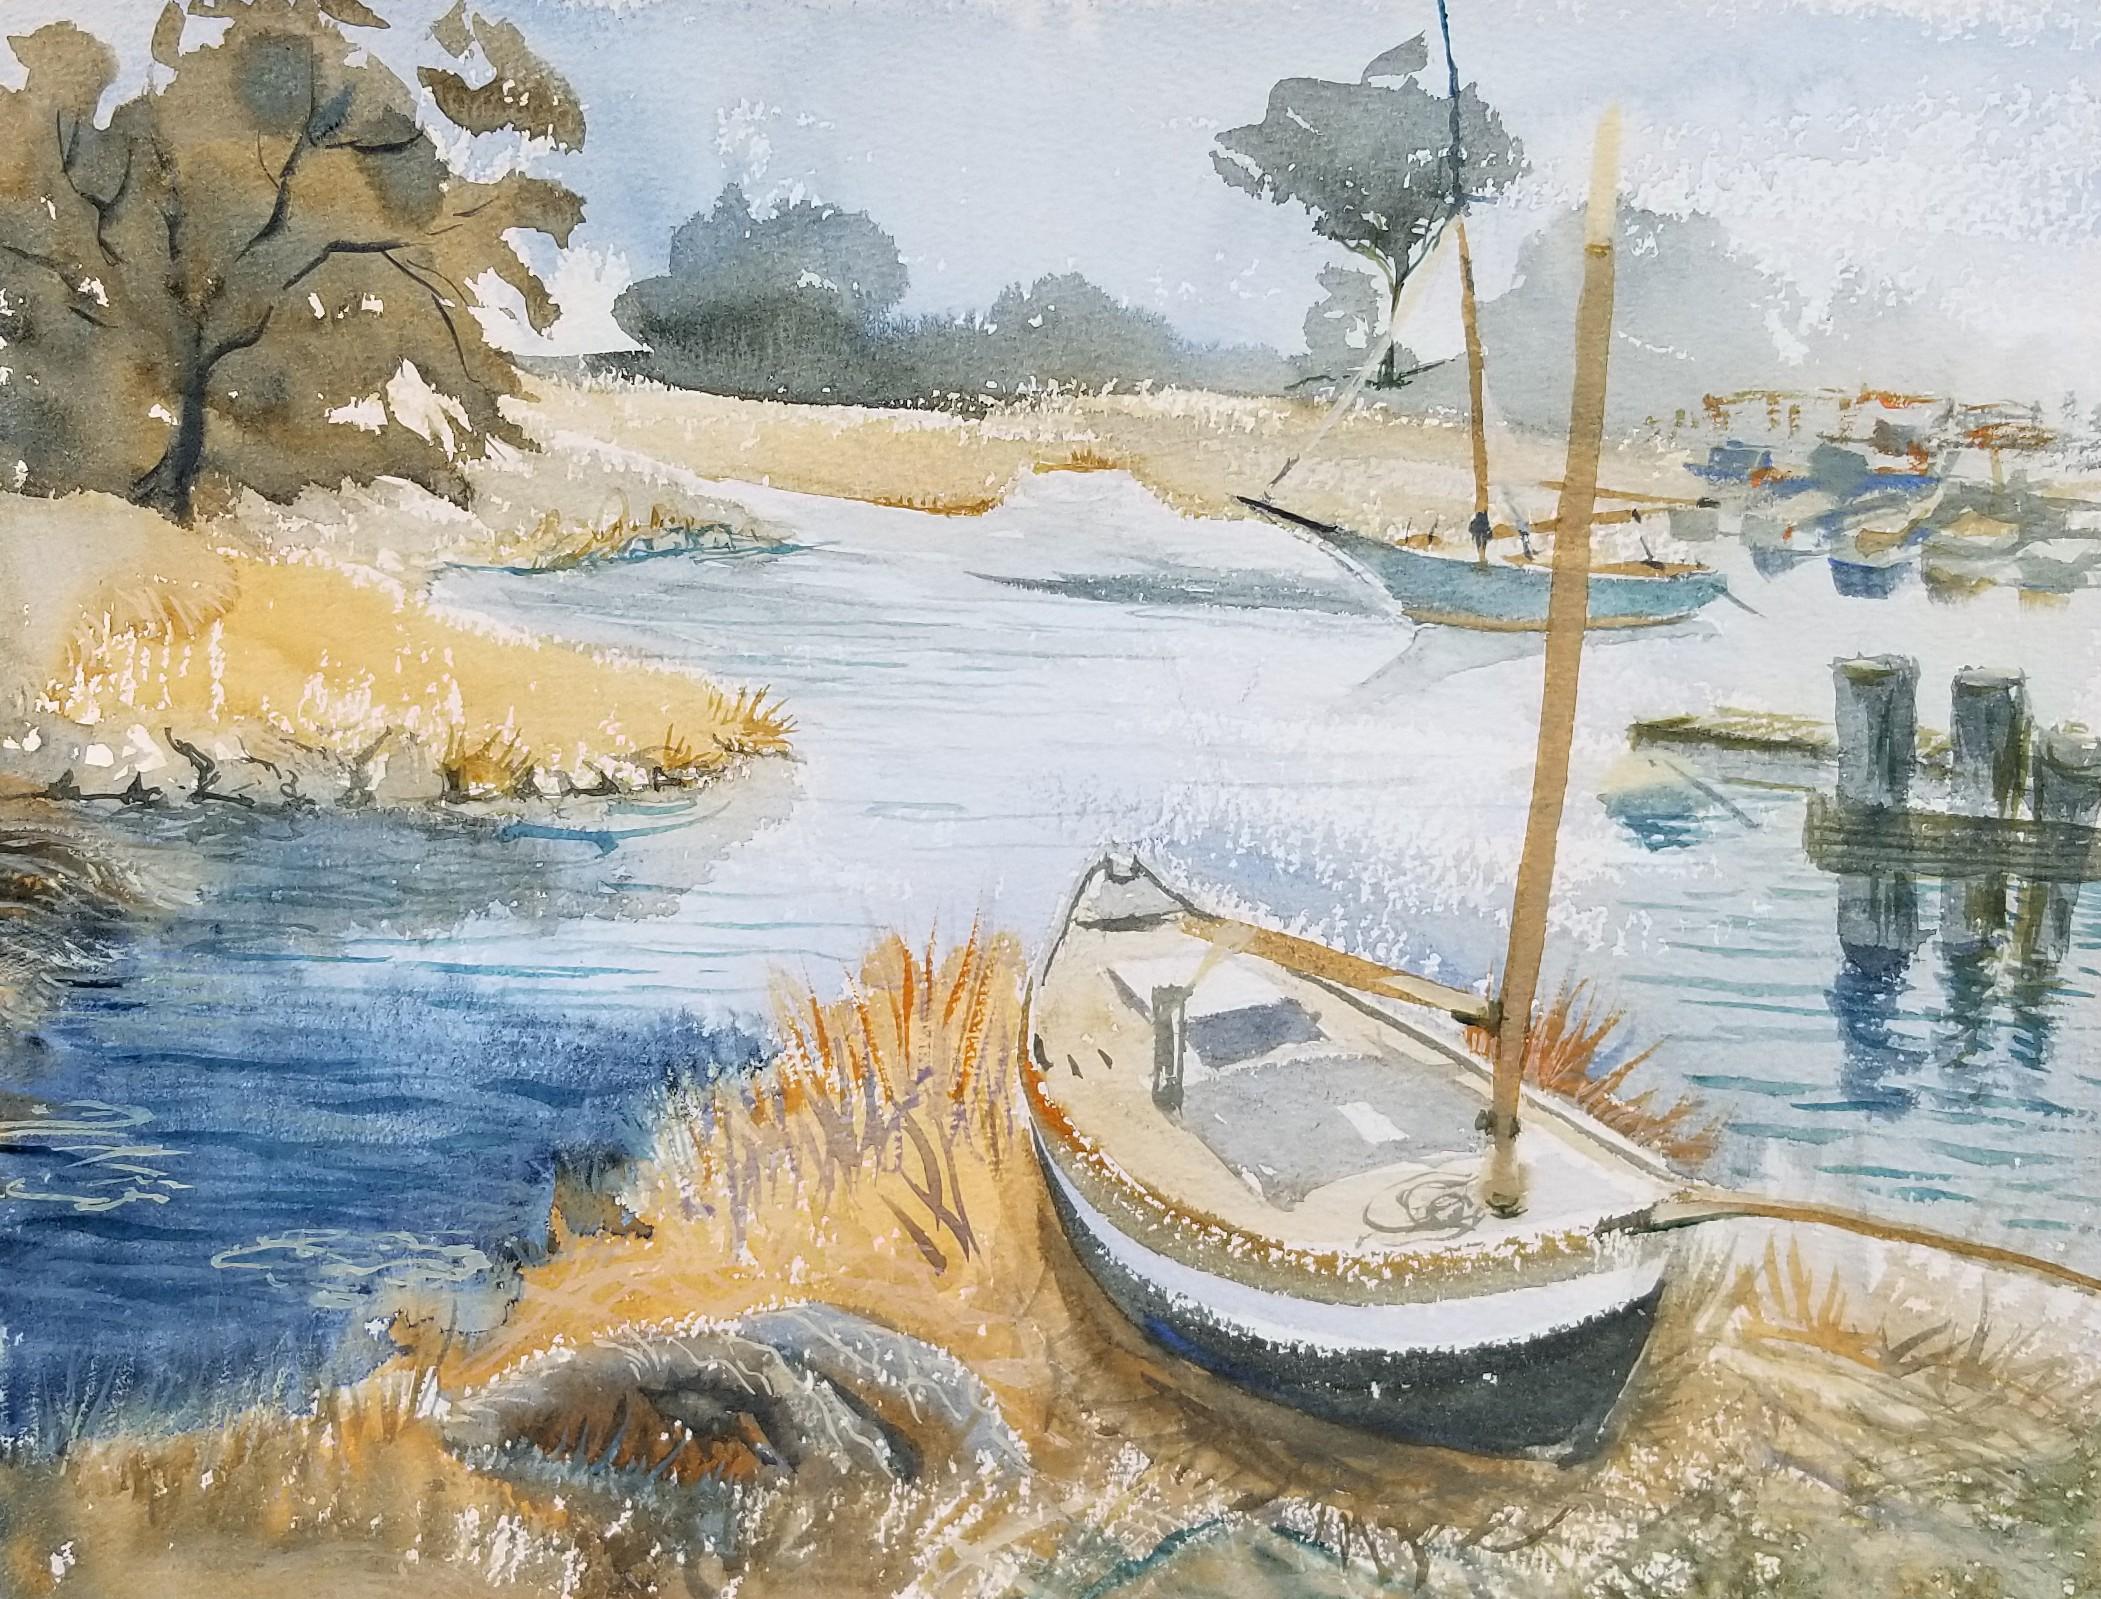 Essex River boatyard-watercolor-NancyBoyle 11x14.jpg